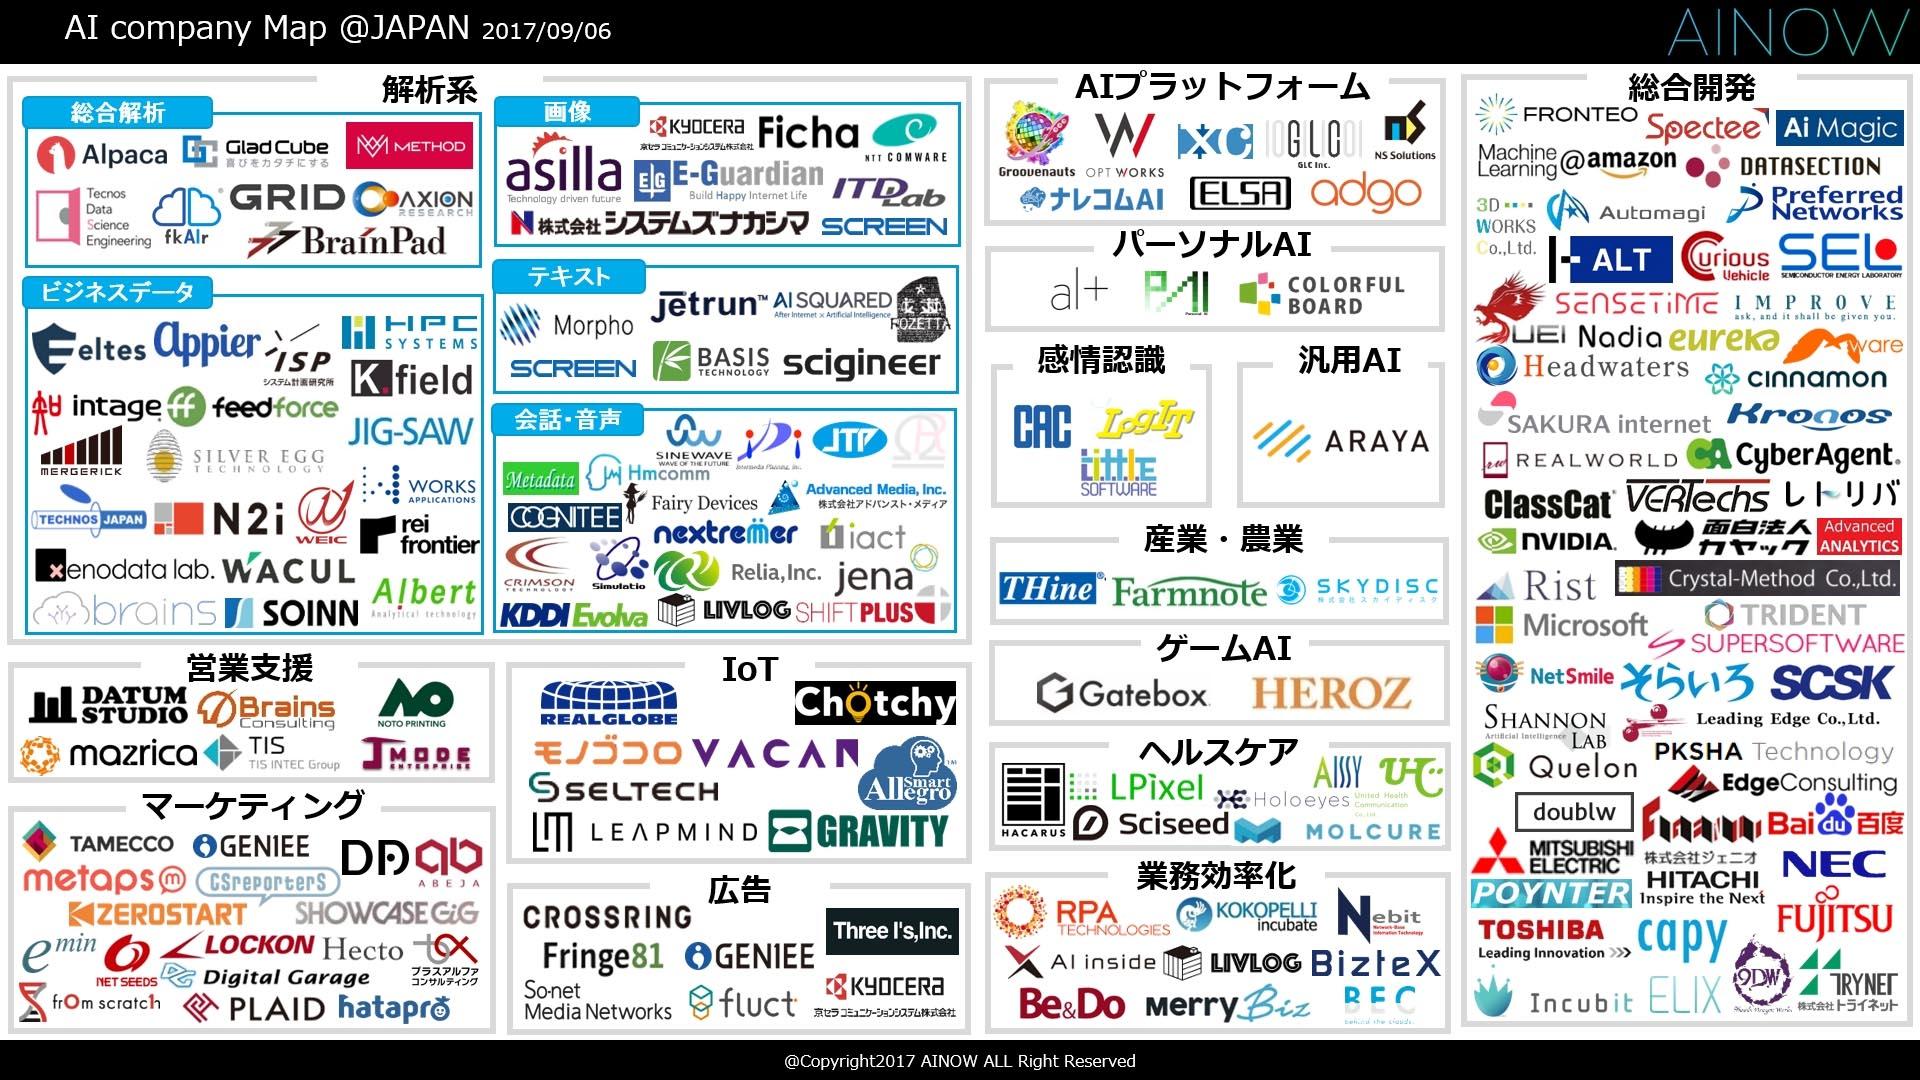 「ai業界マップ2017年夏最新版」、ディップが公開:ai関連事業を日本で展開する企業をリストアップ @it